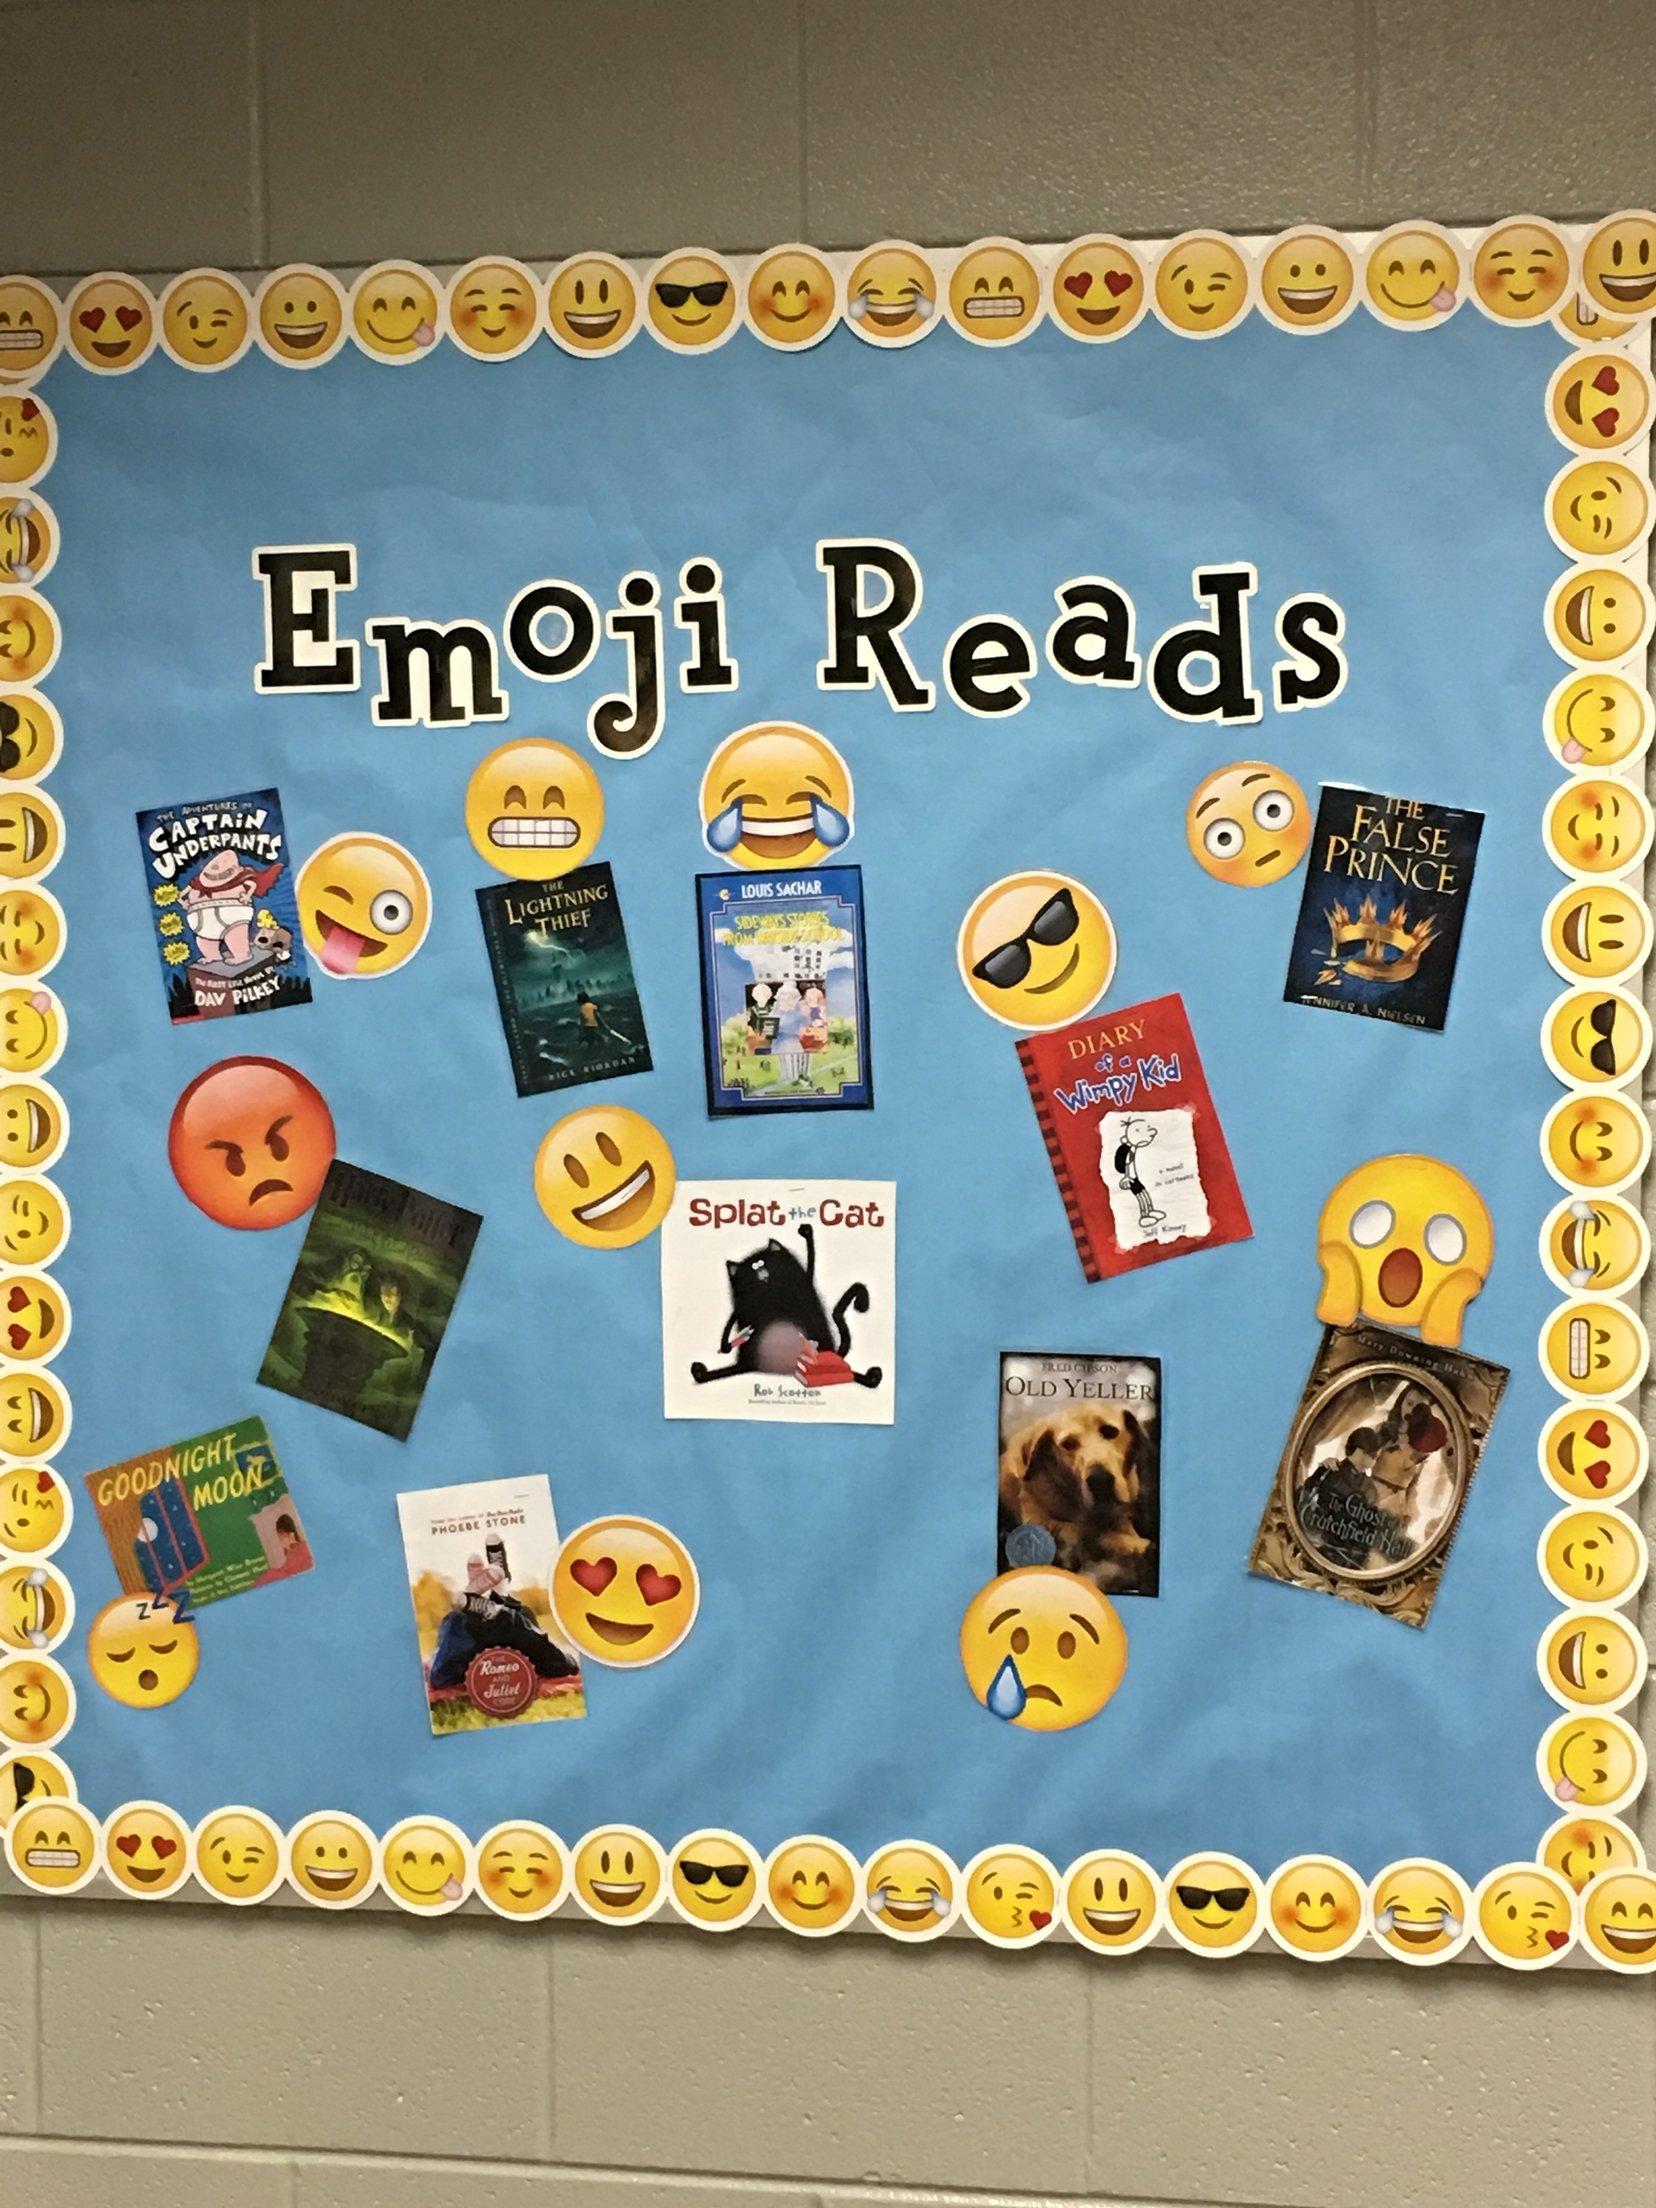 10 Elegant Fall Reading Bulletin Board Ideas emoji reading bulletin board school displays decorations 2021